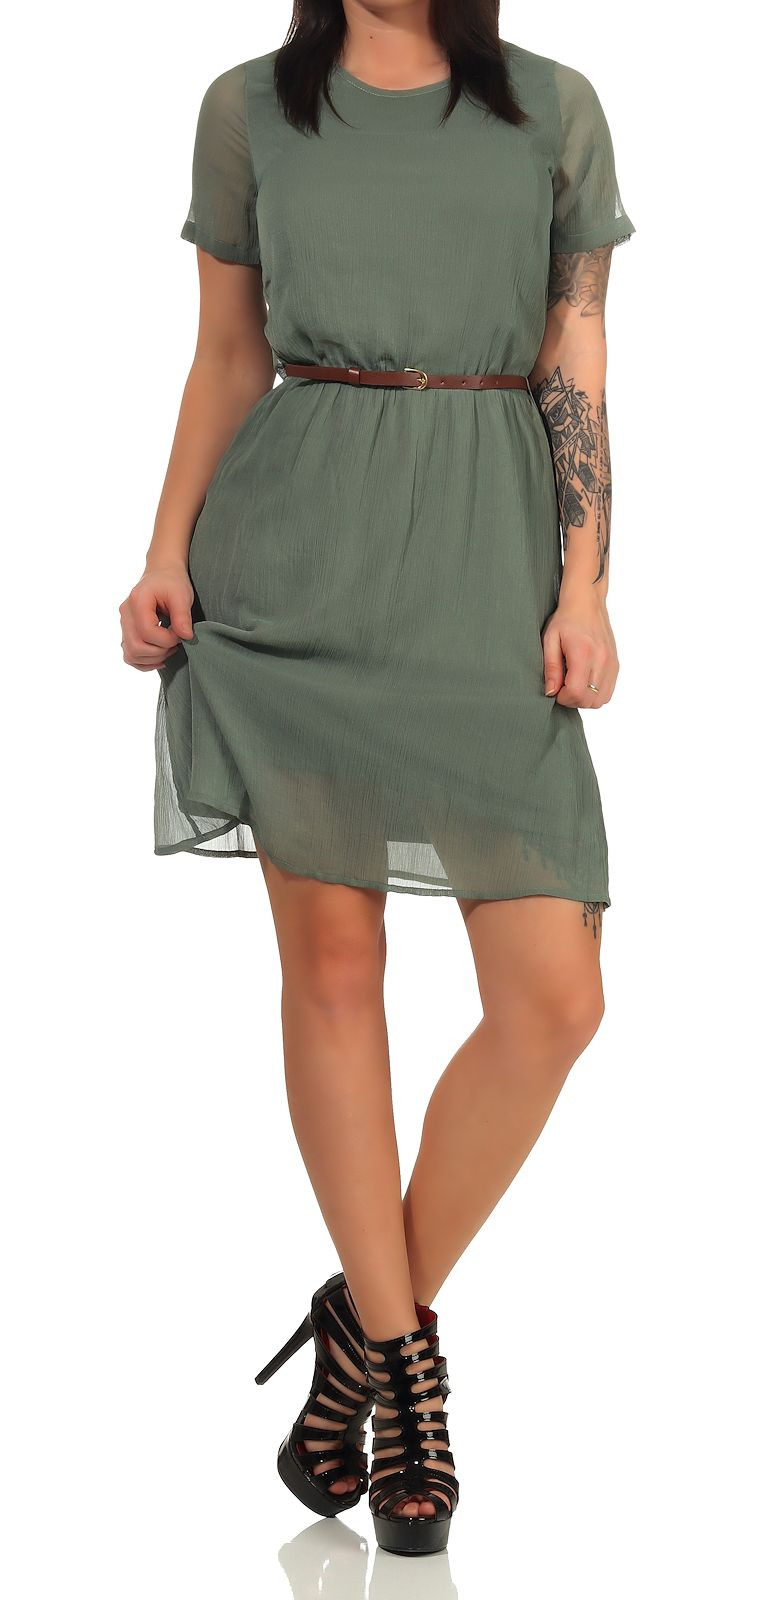 Vero Moda Damen Kleid Frida  Röcke/ Kleider  Damen  Le